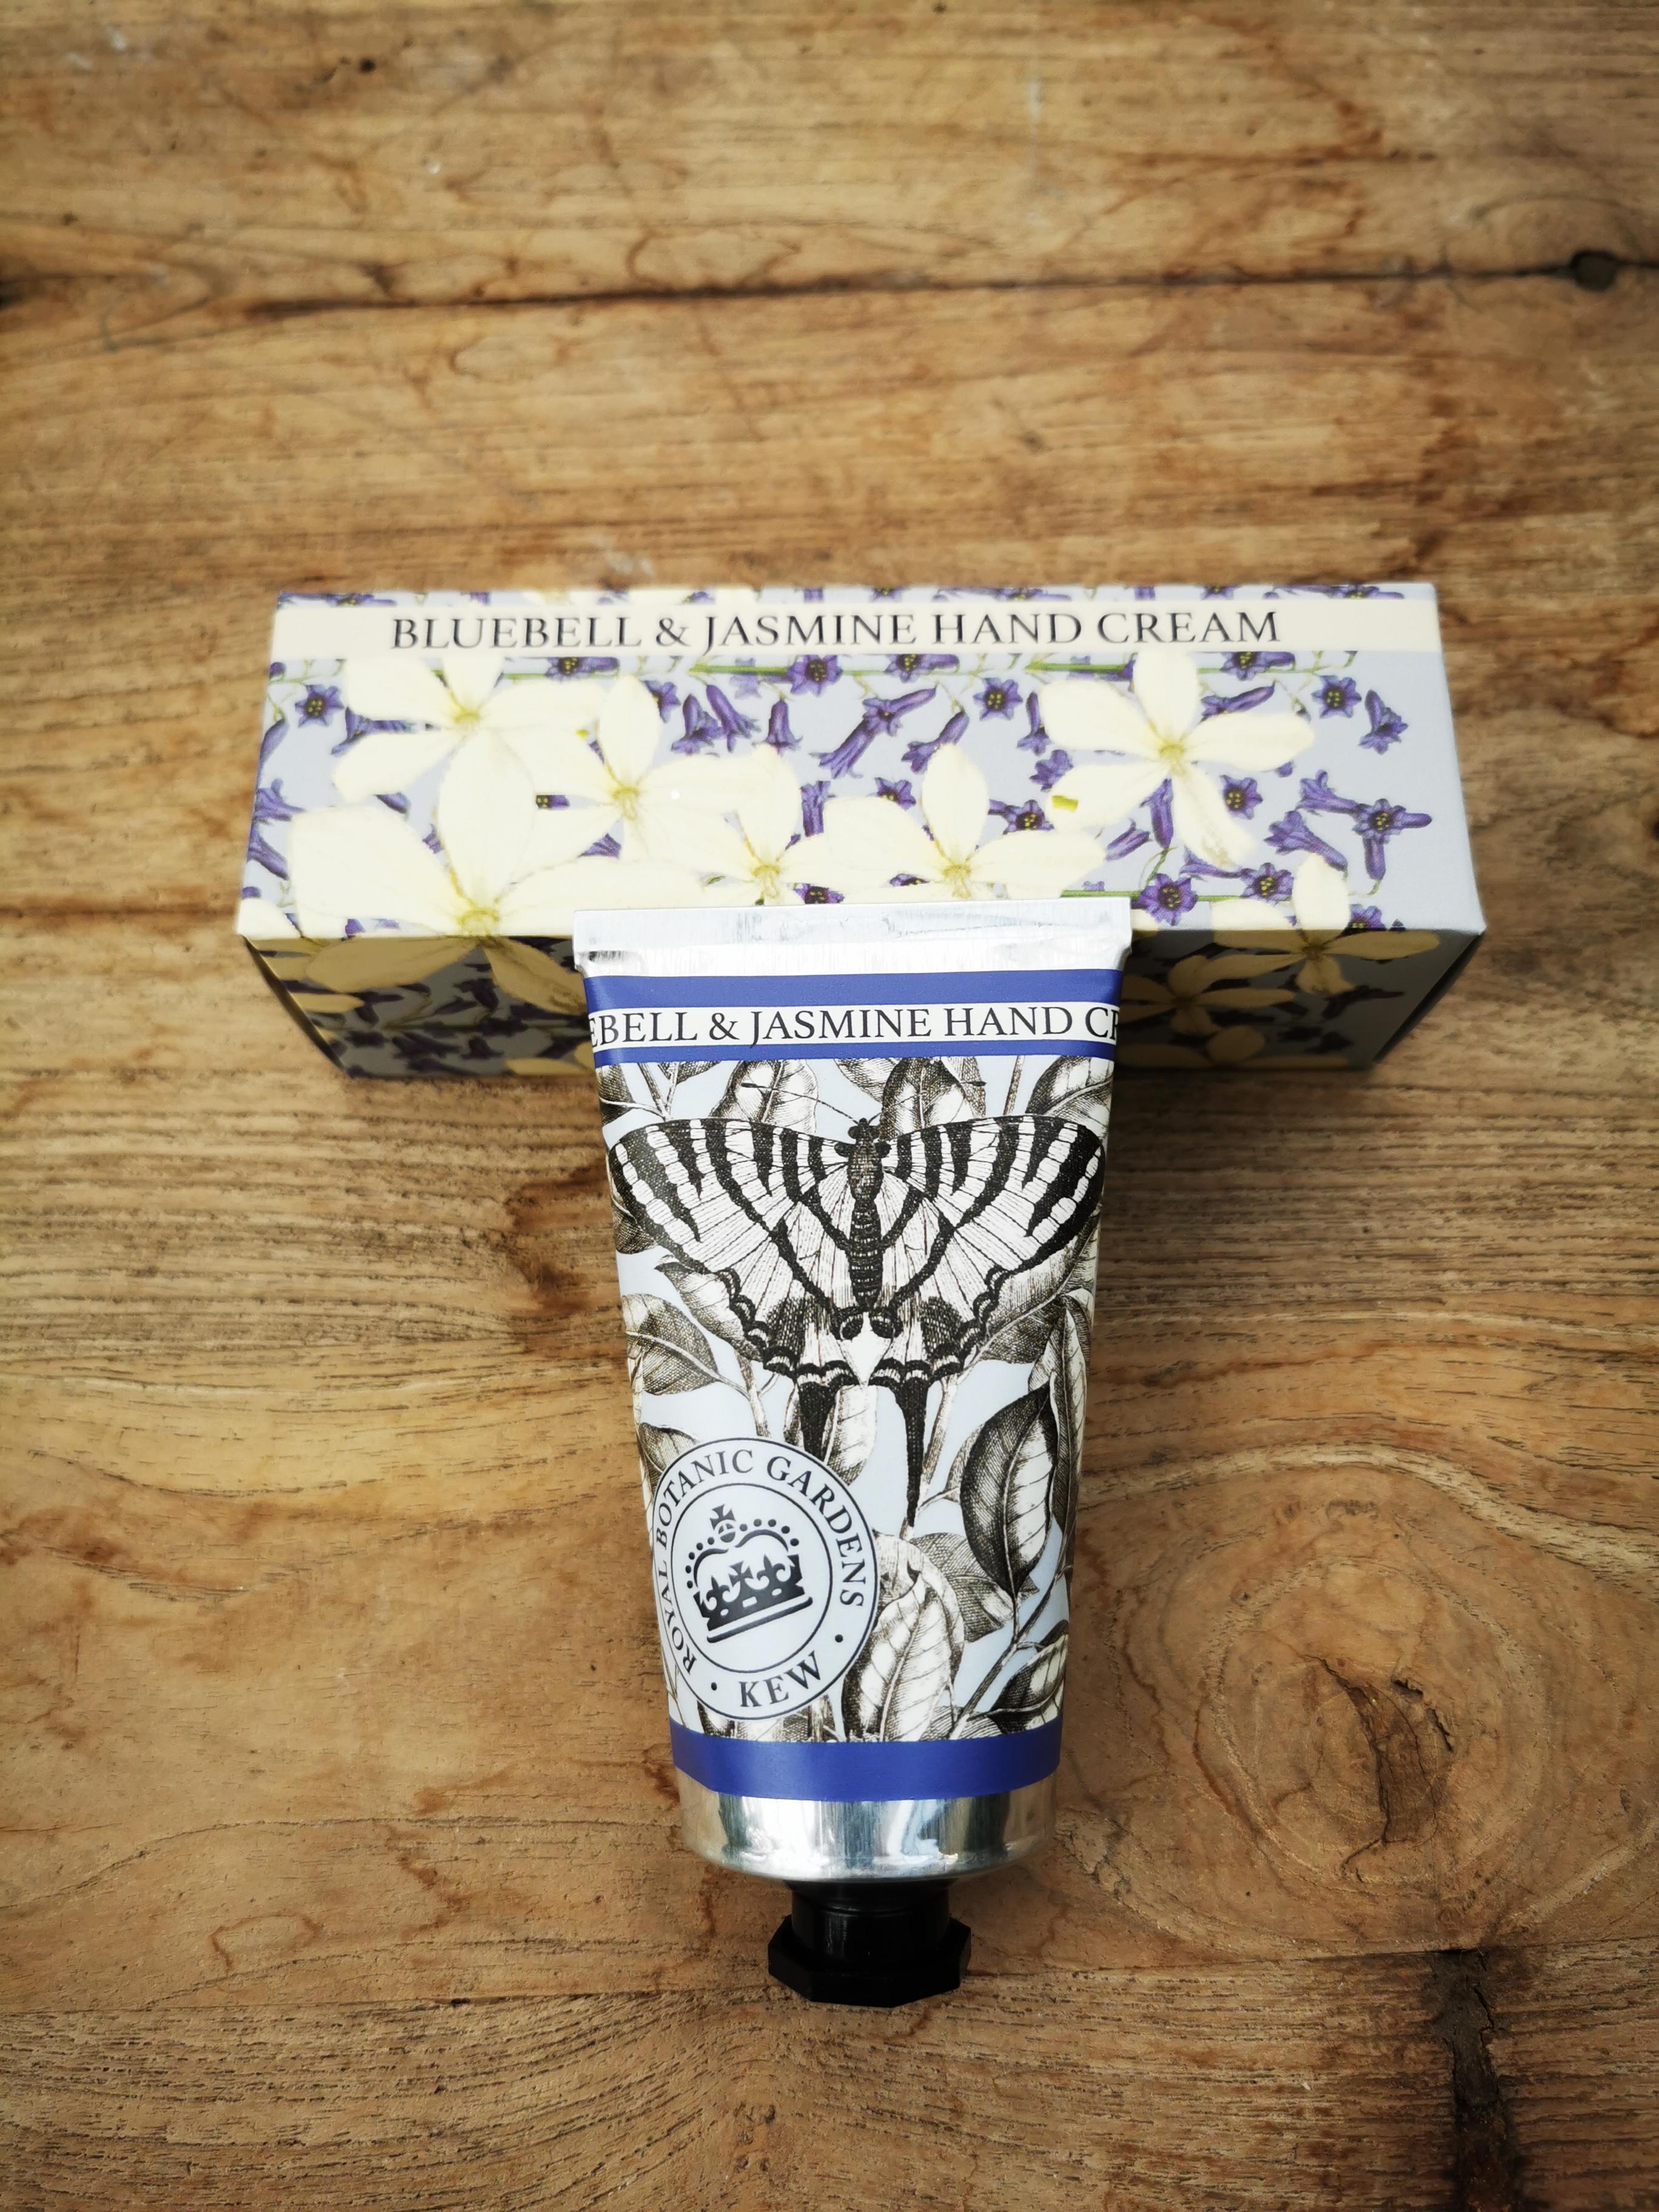 Kew Hand Cream Bluebell & Jasmine